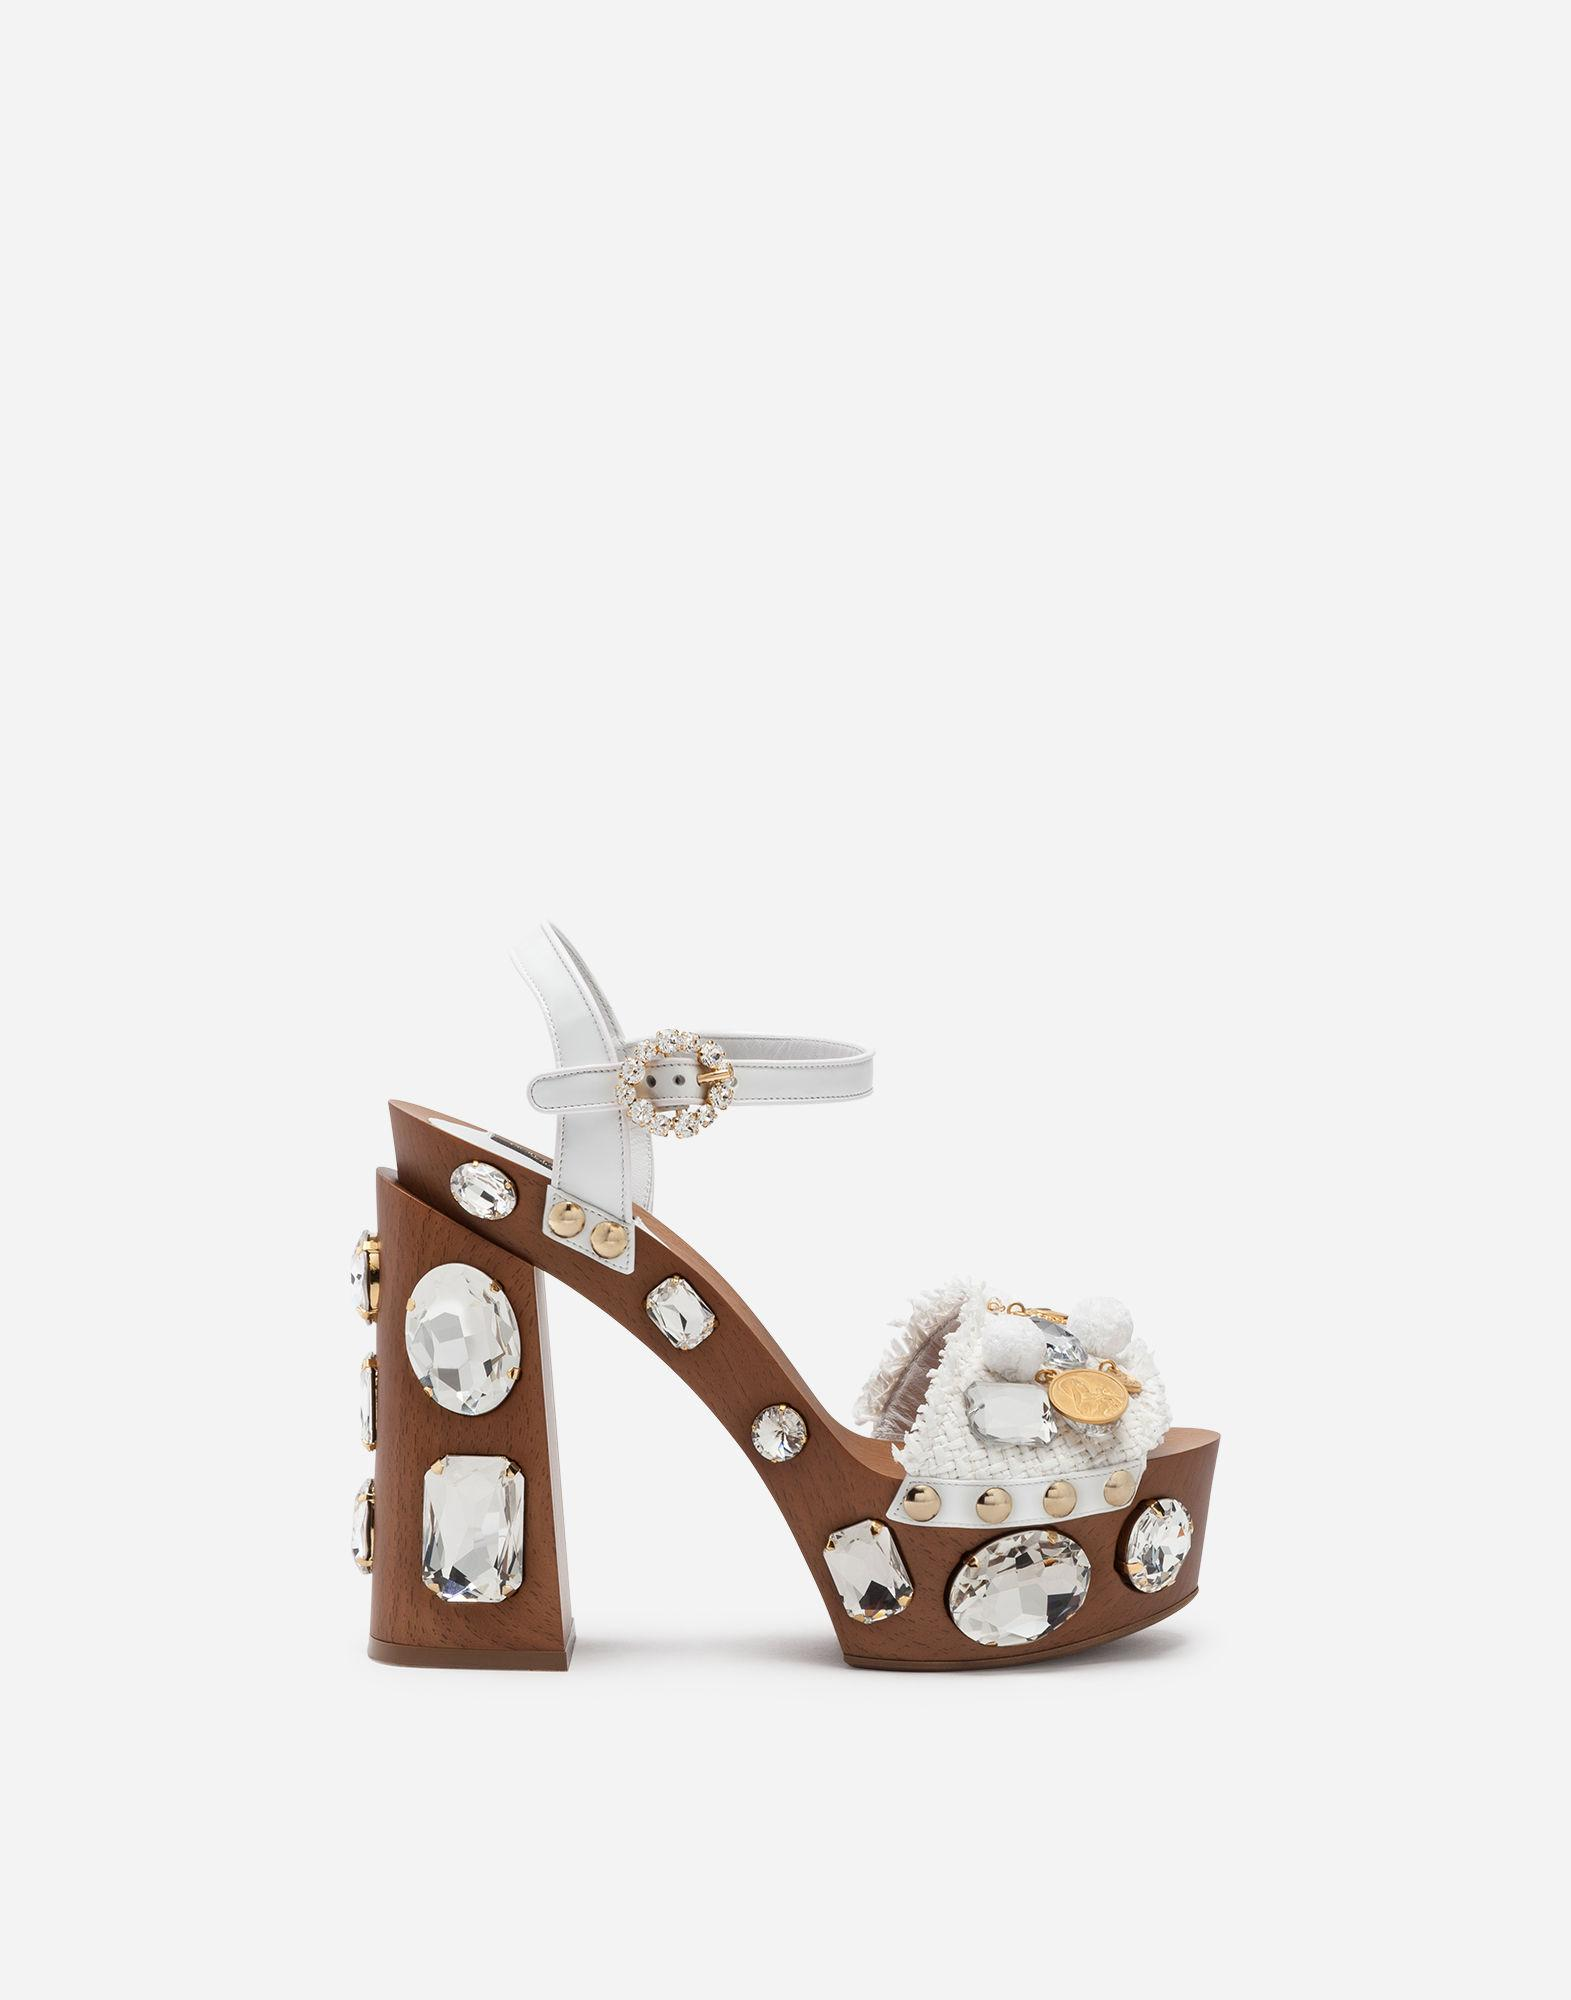 6963e5b2f4d6 Lyst - Dolce   Gabbana Sandals In Raffia With Platform And Jewel ...